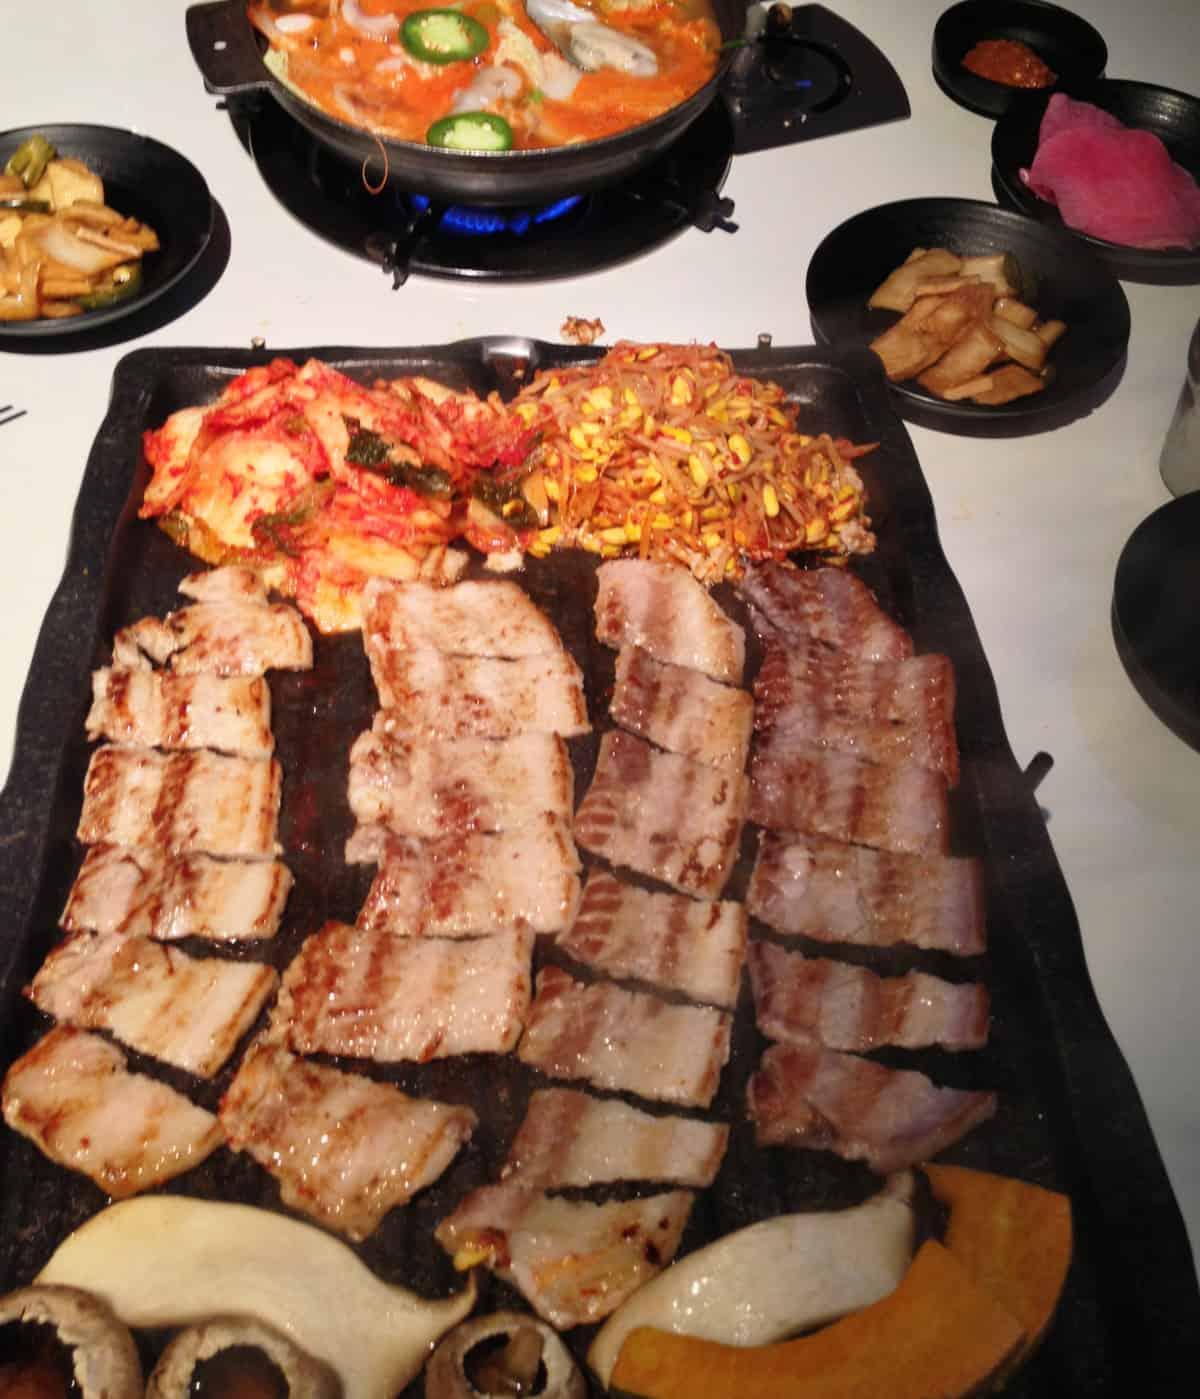 Grilled Porkbelly